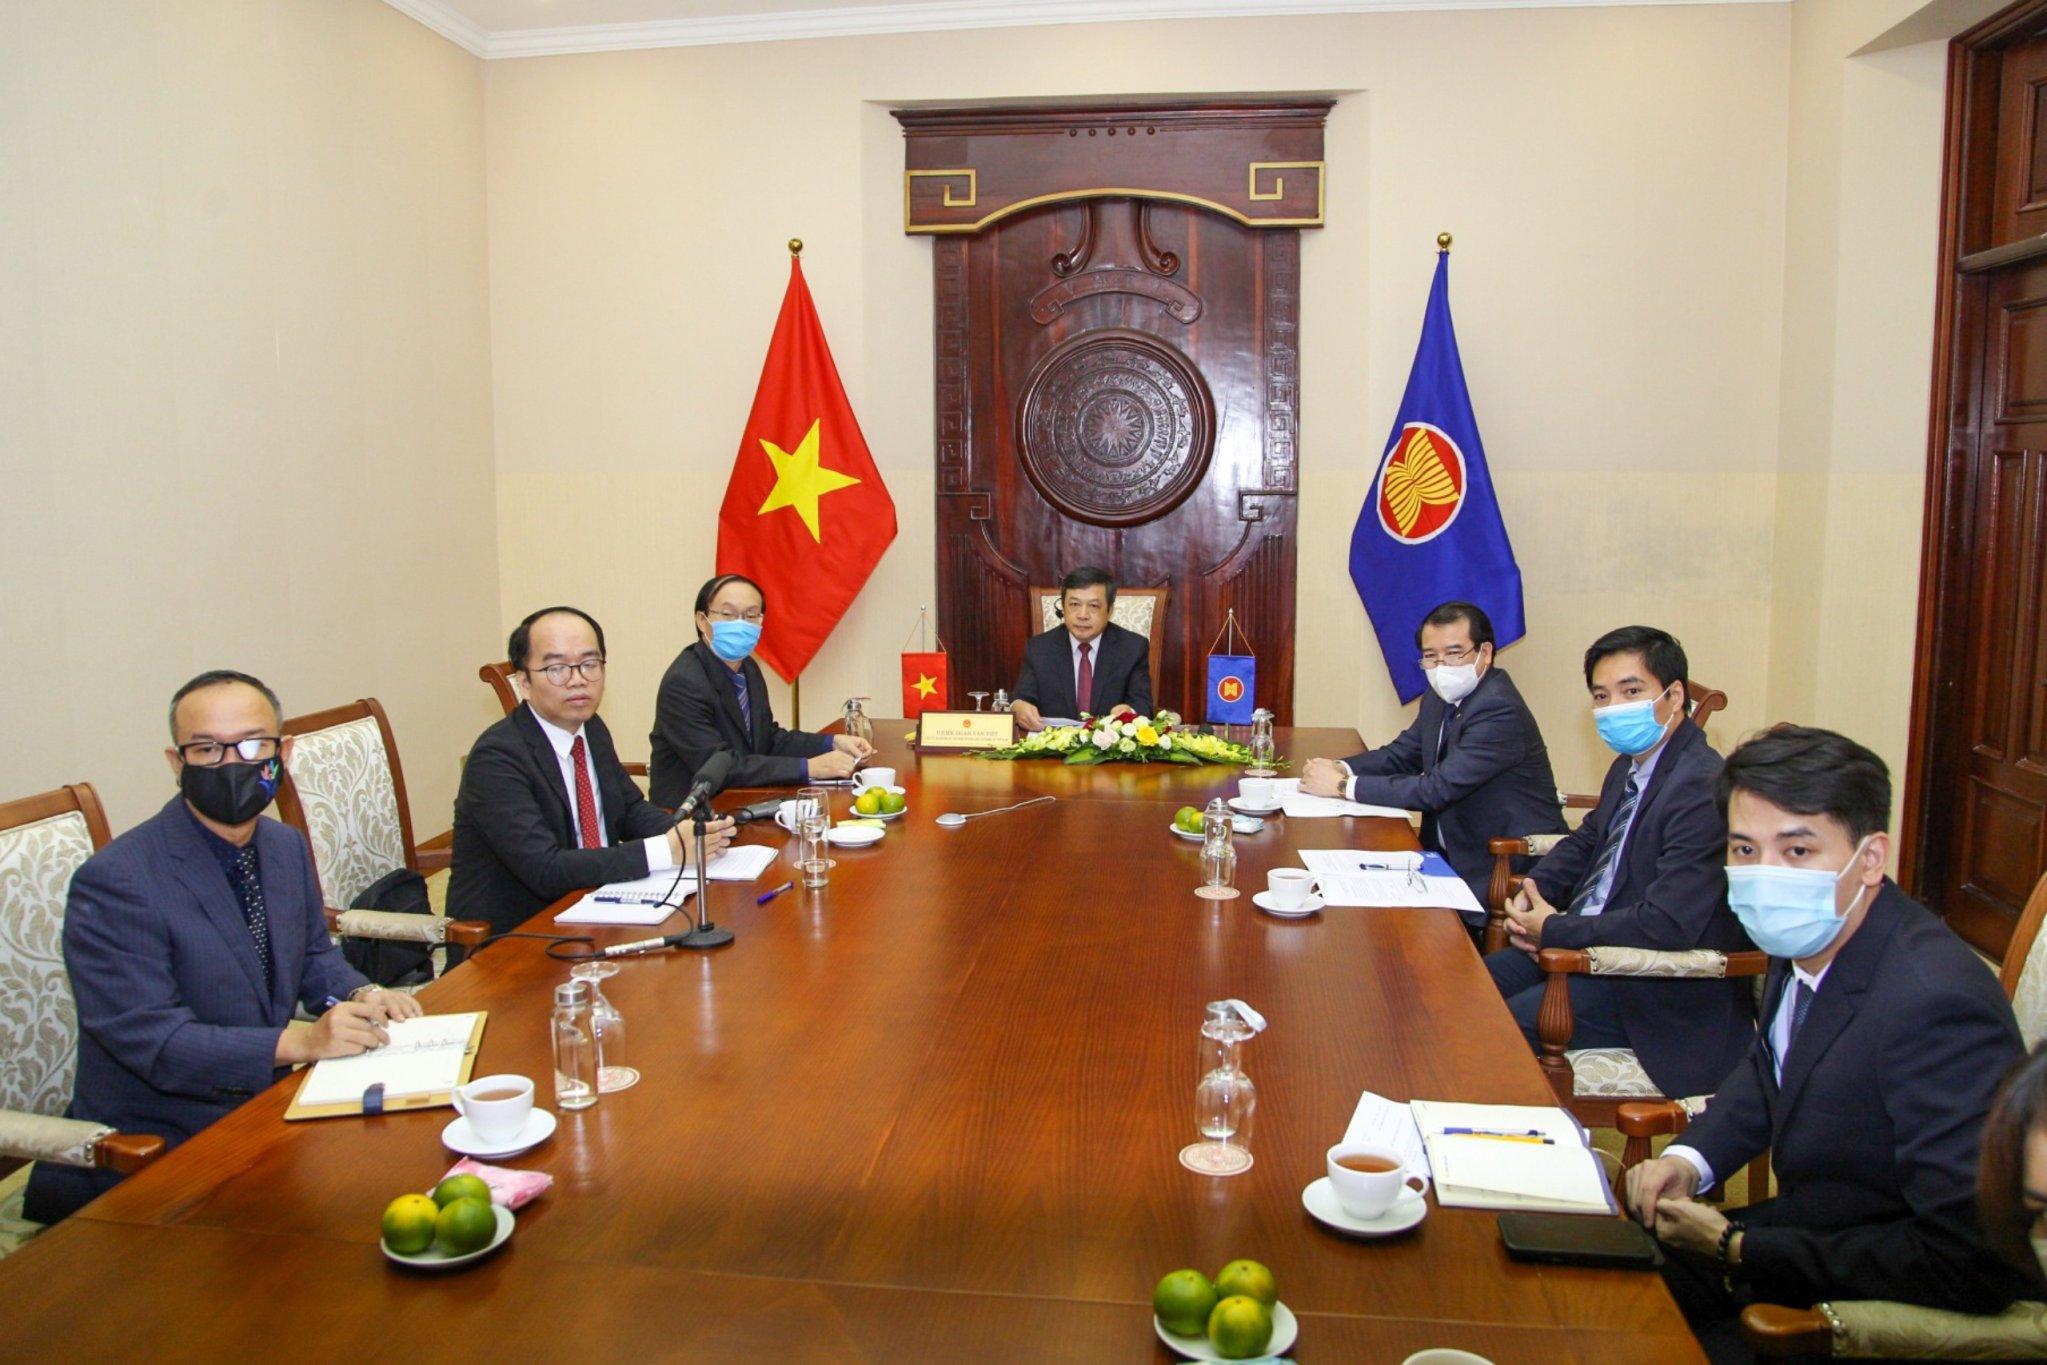 ASEAN mở cửa lại điểm đến cho khách du lịch quốc tế -0